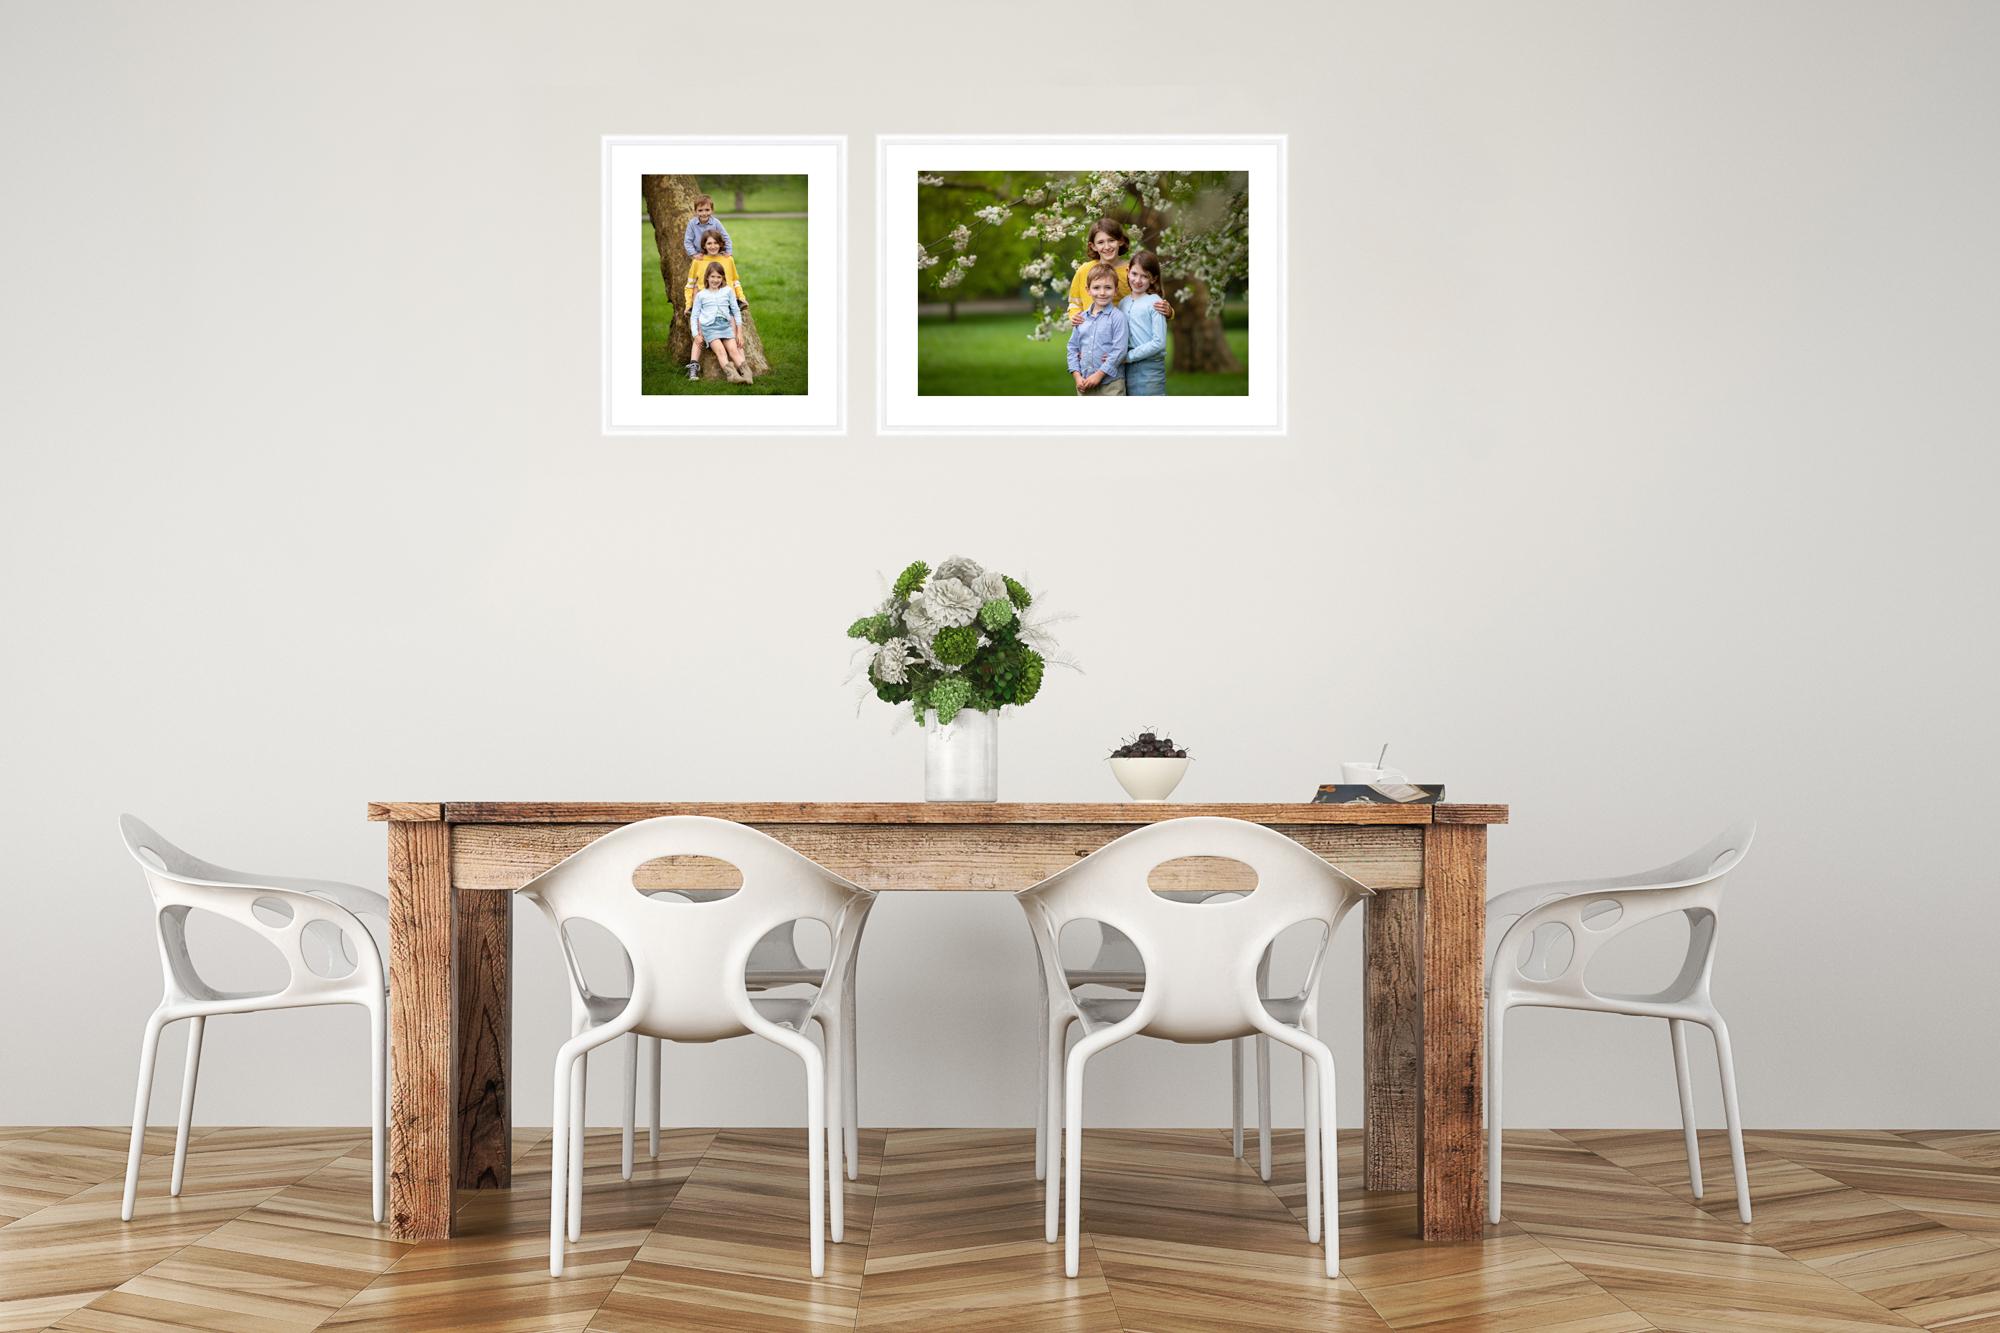 London-children-family-photographer-dulwich 20190503 Digitalab room mock ups - kitchen two frames _.jpg